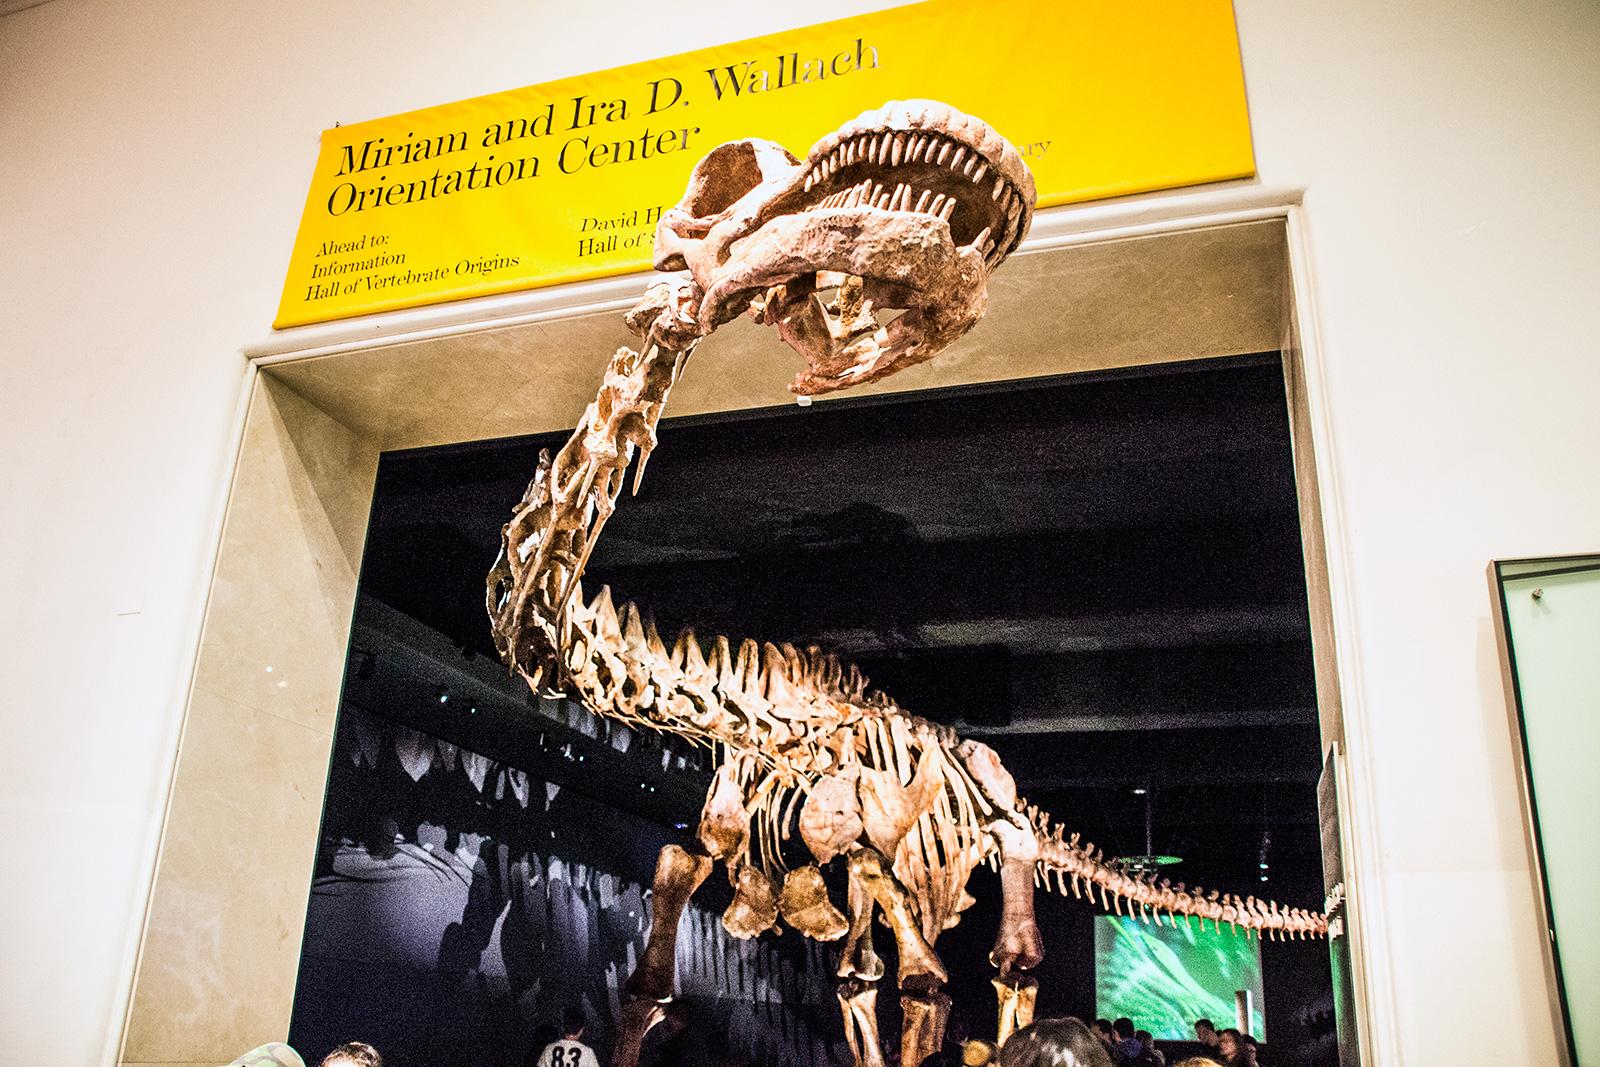 Dinosaurio del Museo Americano de Historia Natural - New York CityPass